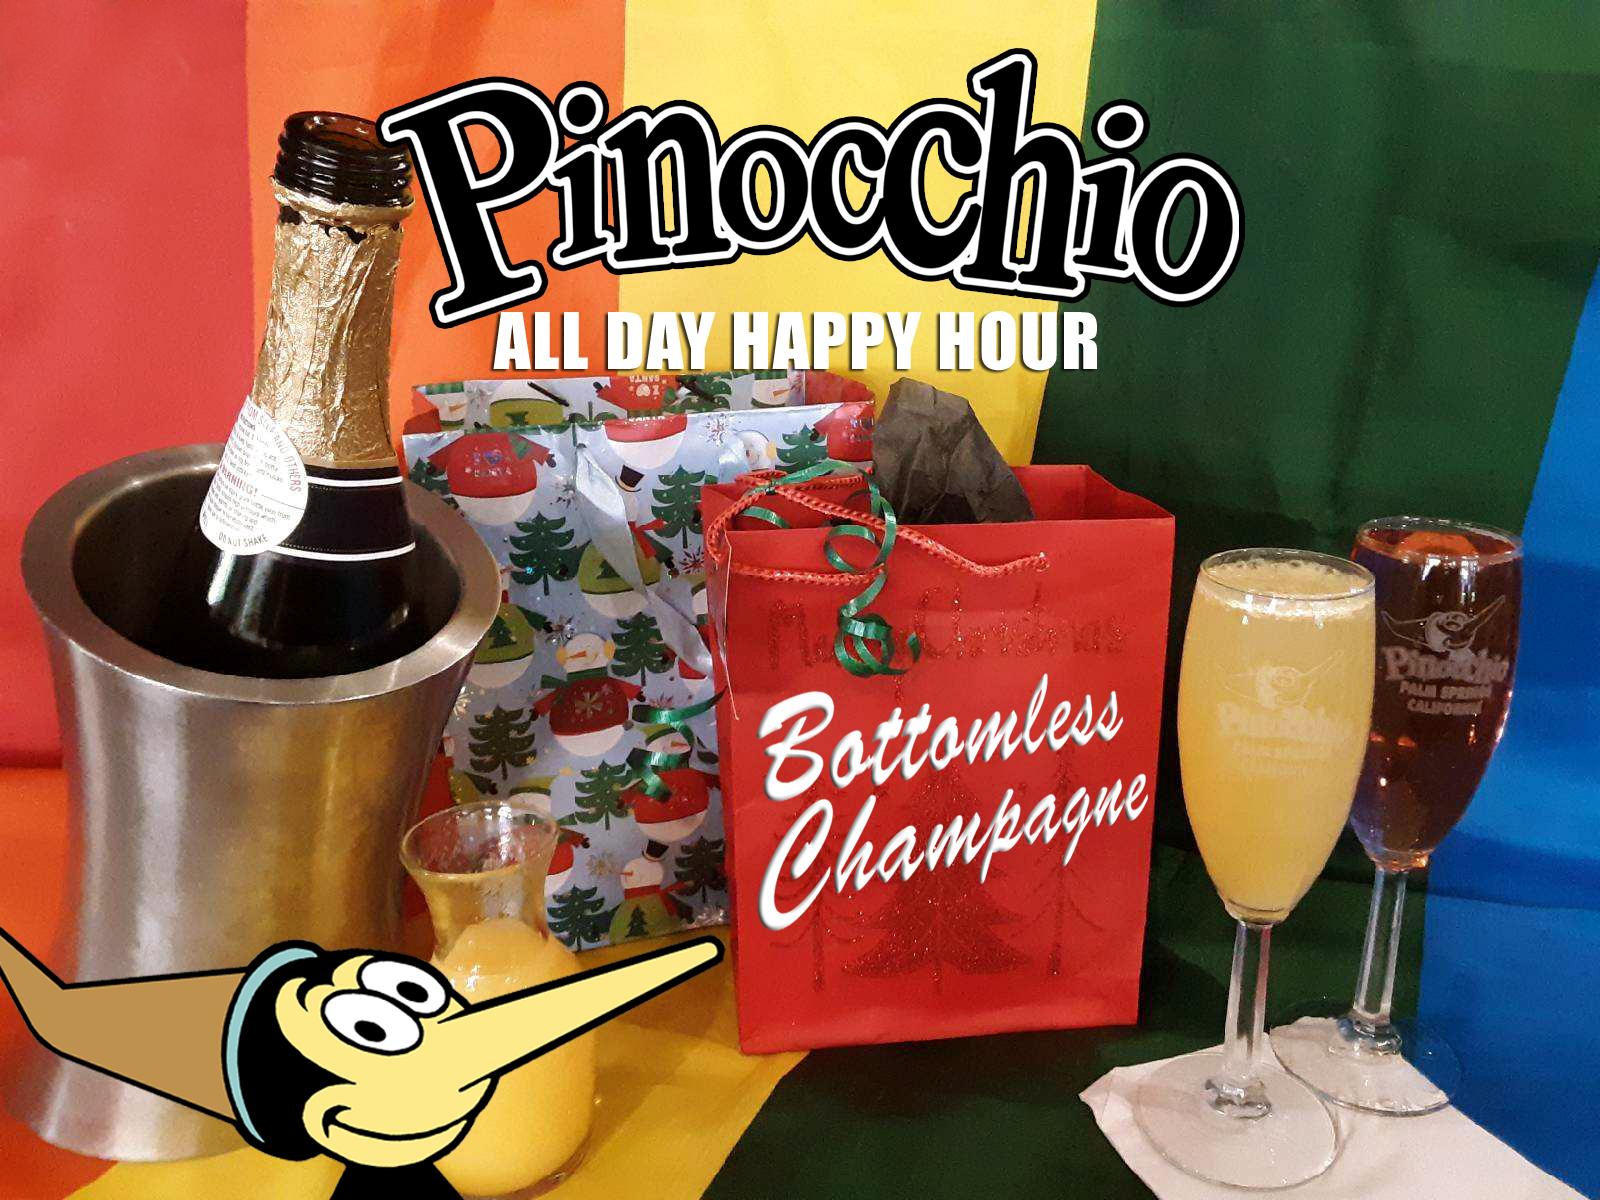 Pinocchio Bottomless Champagne